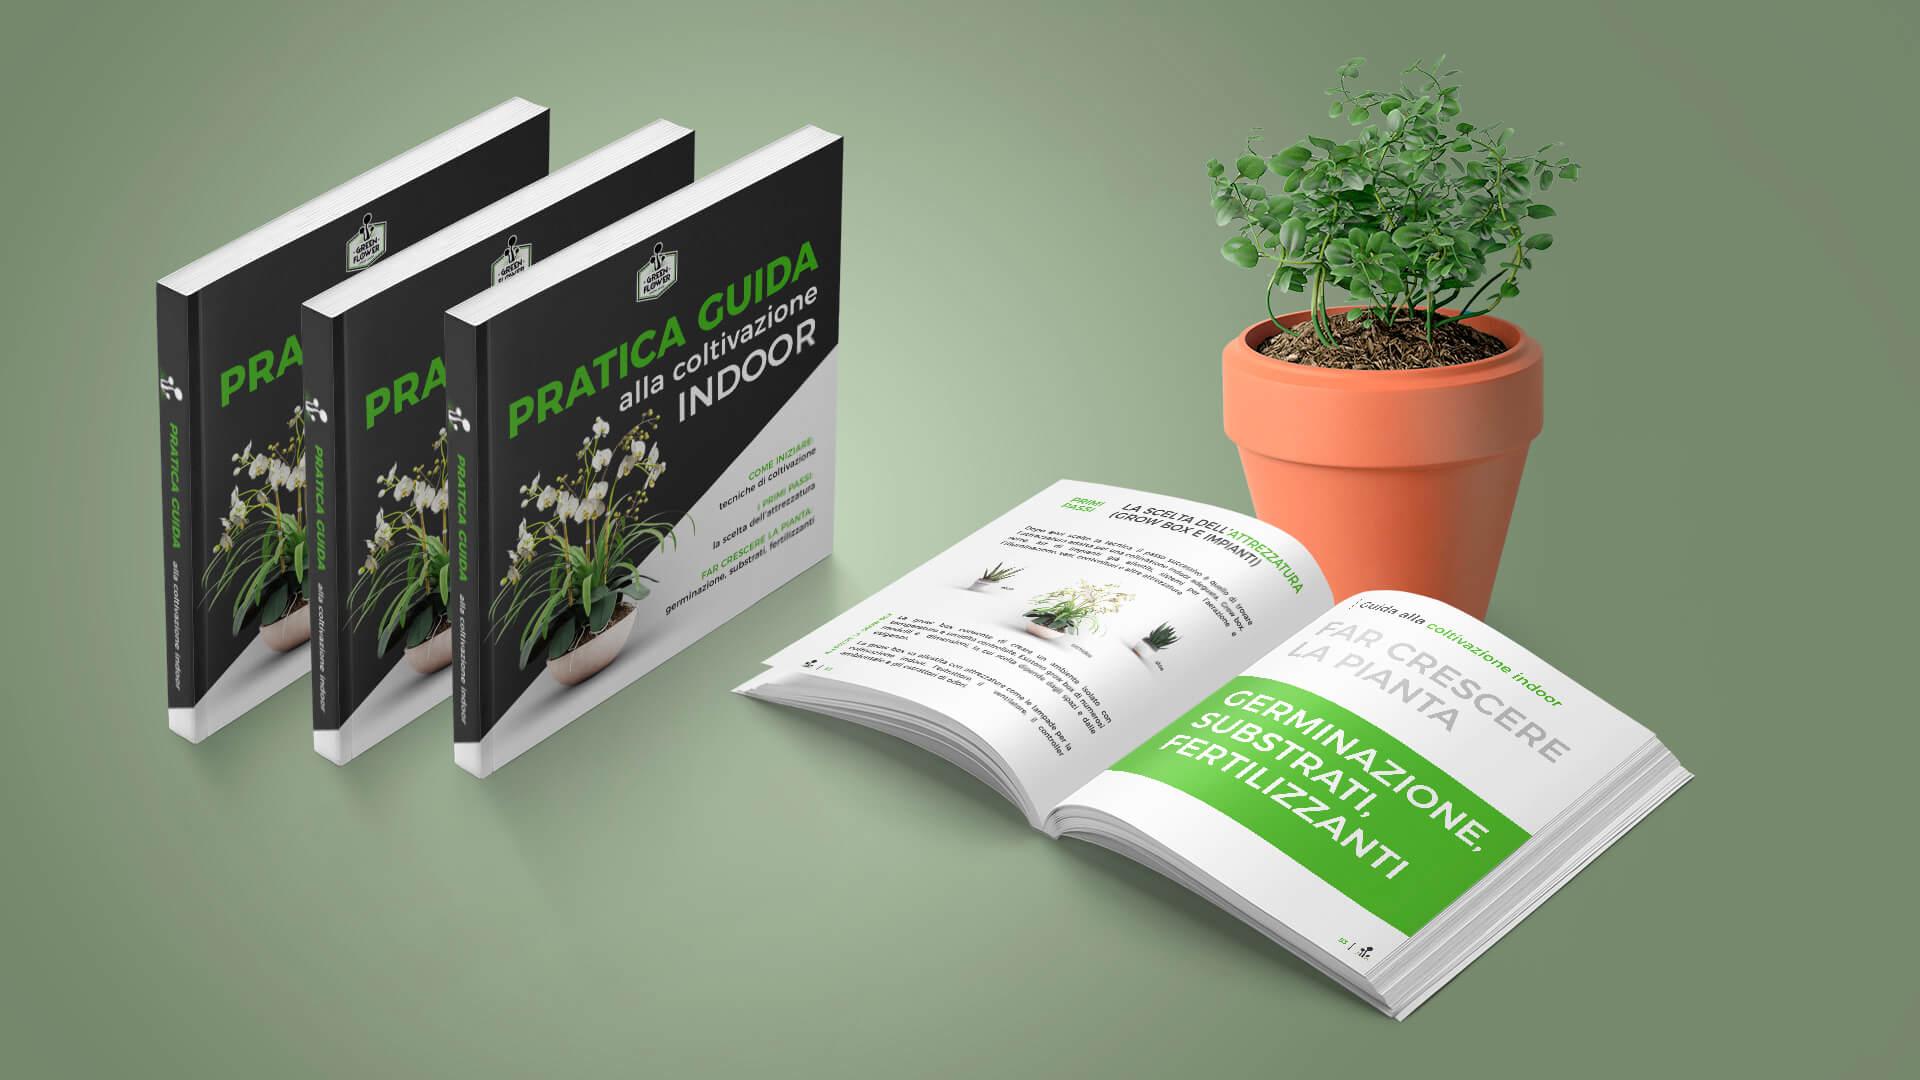 guida-coltivazione-indoor-verde